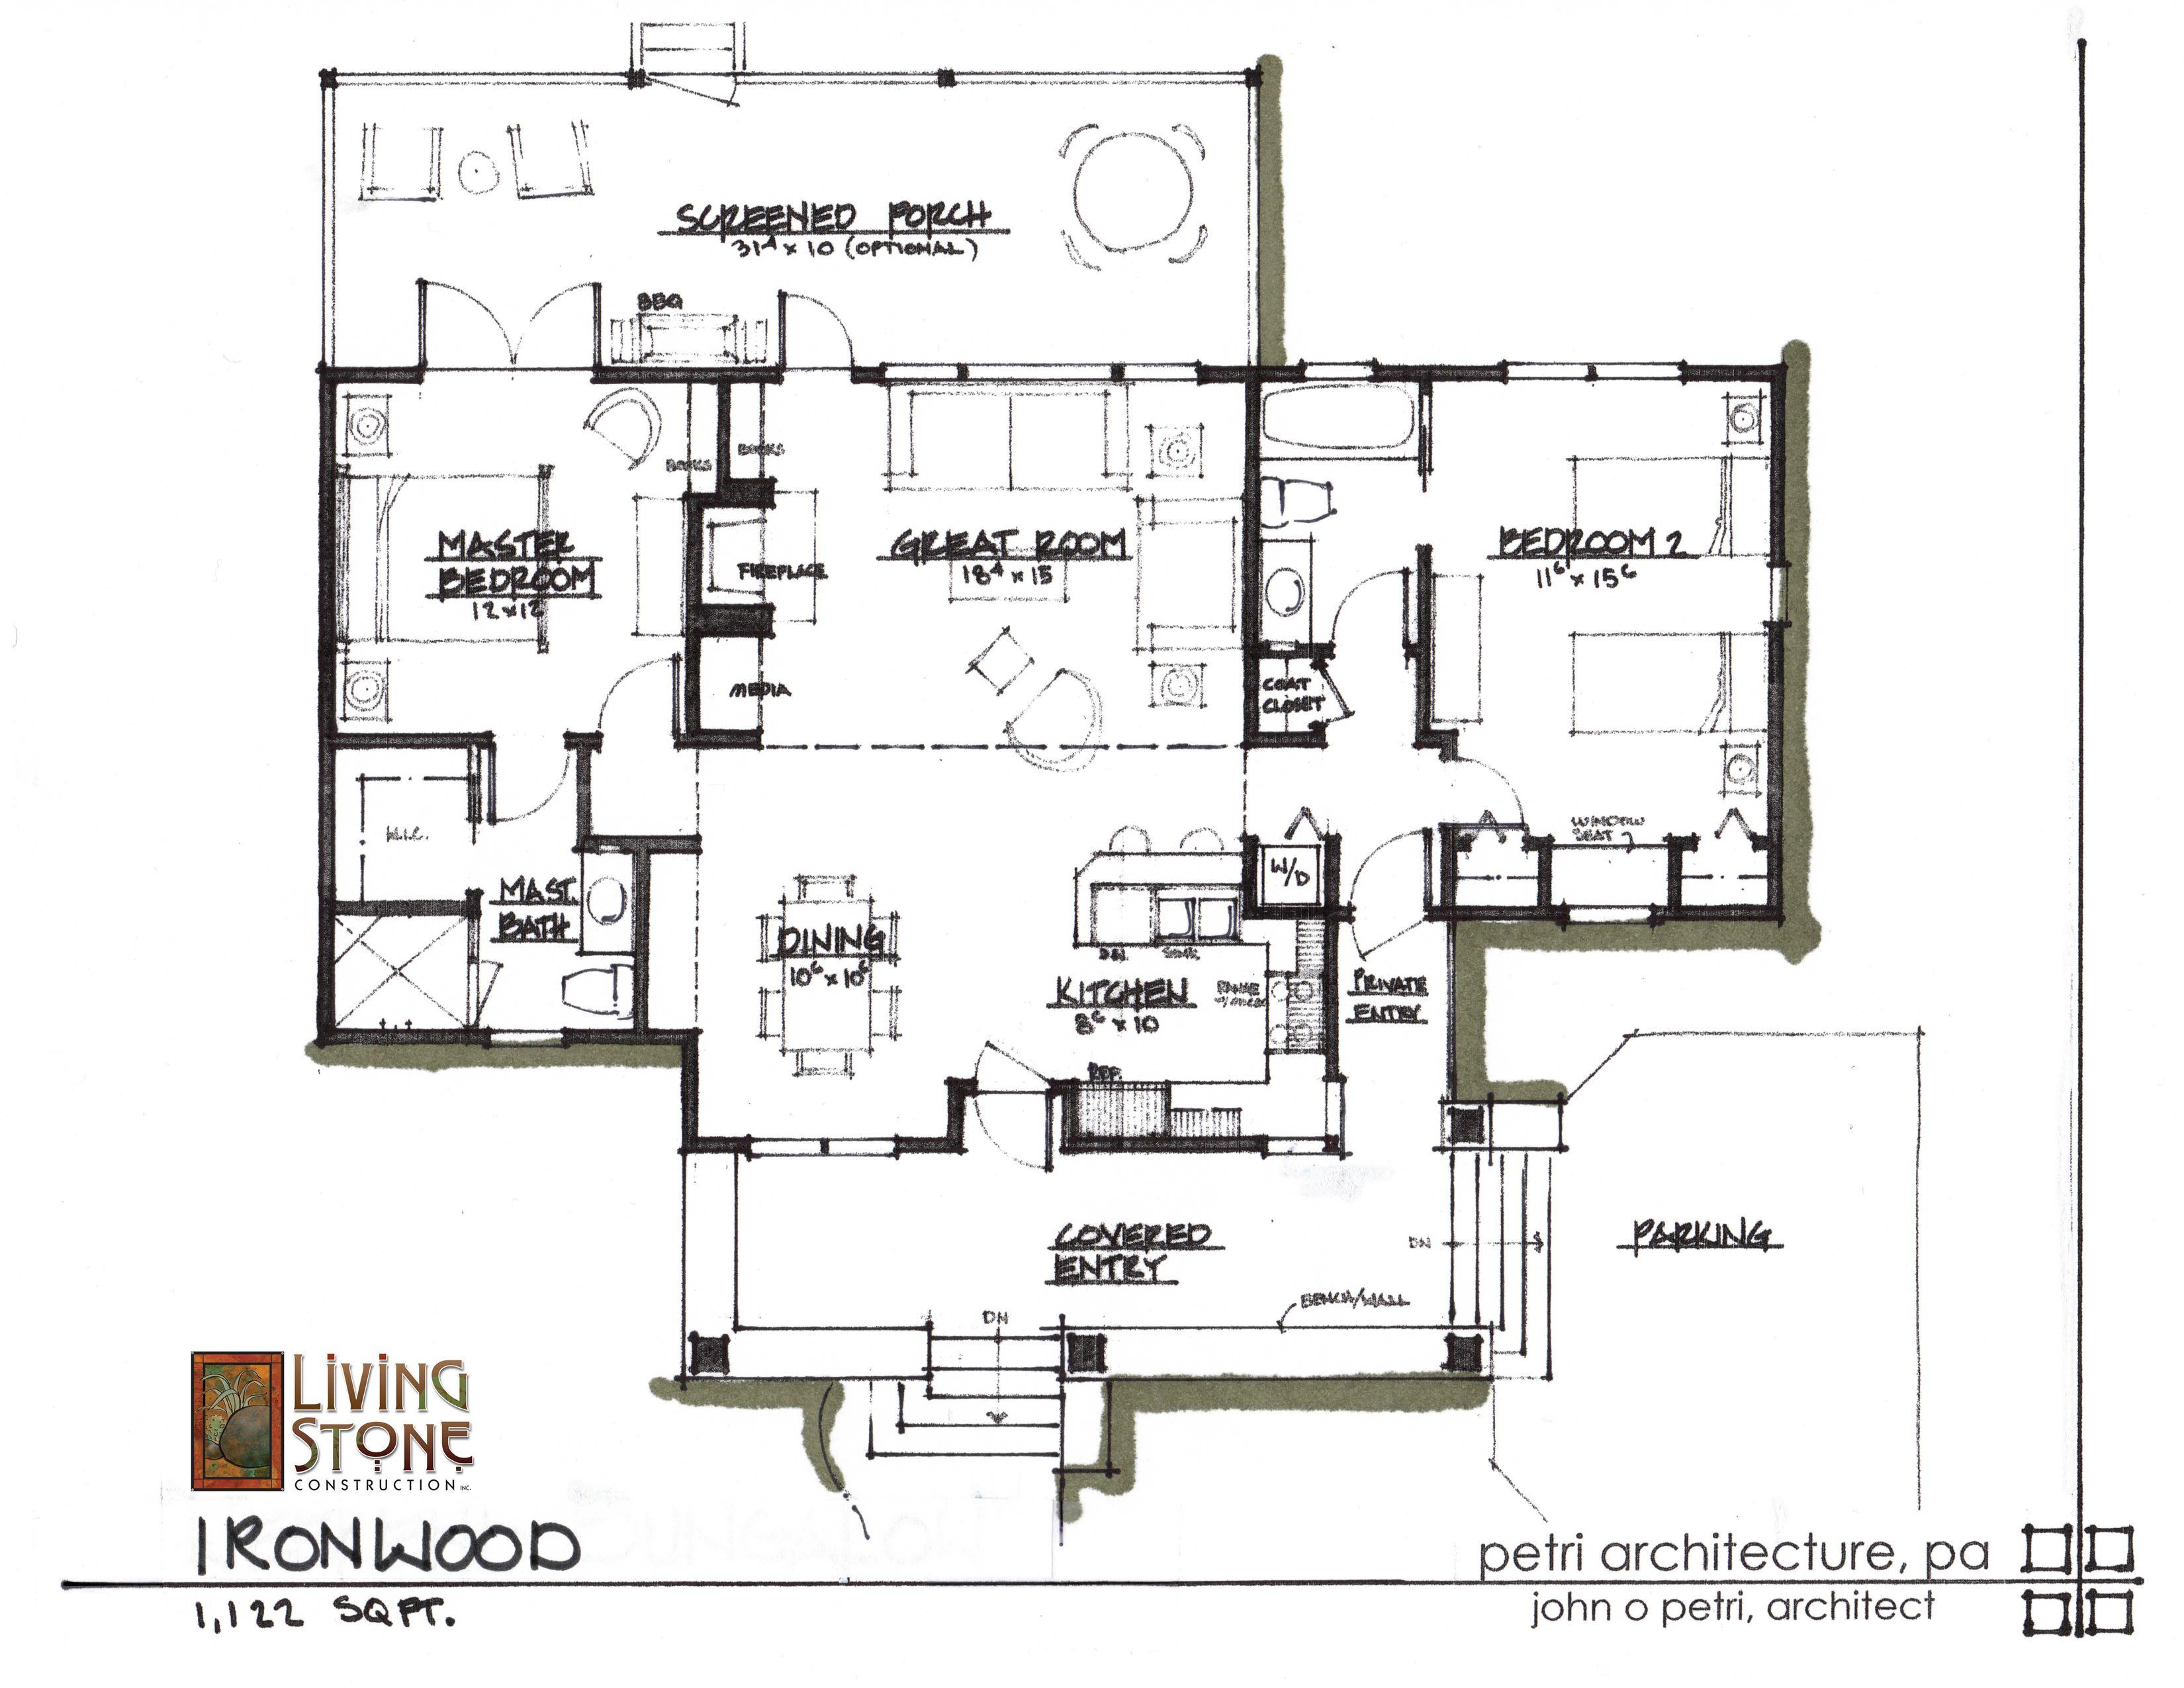 Ironwood Floorplan2 33002550 Future House Pinterest Electrical Wiring Diagrams For Dummies 1700 2550